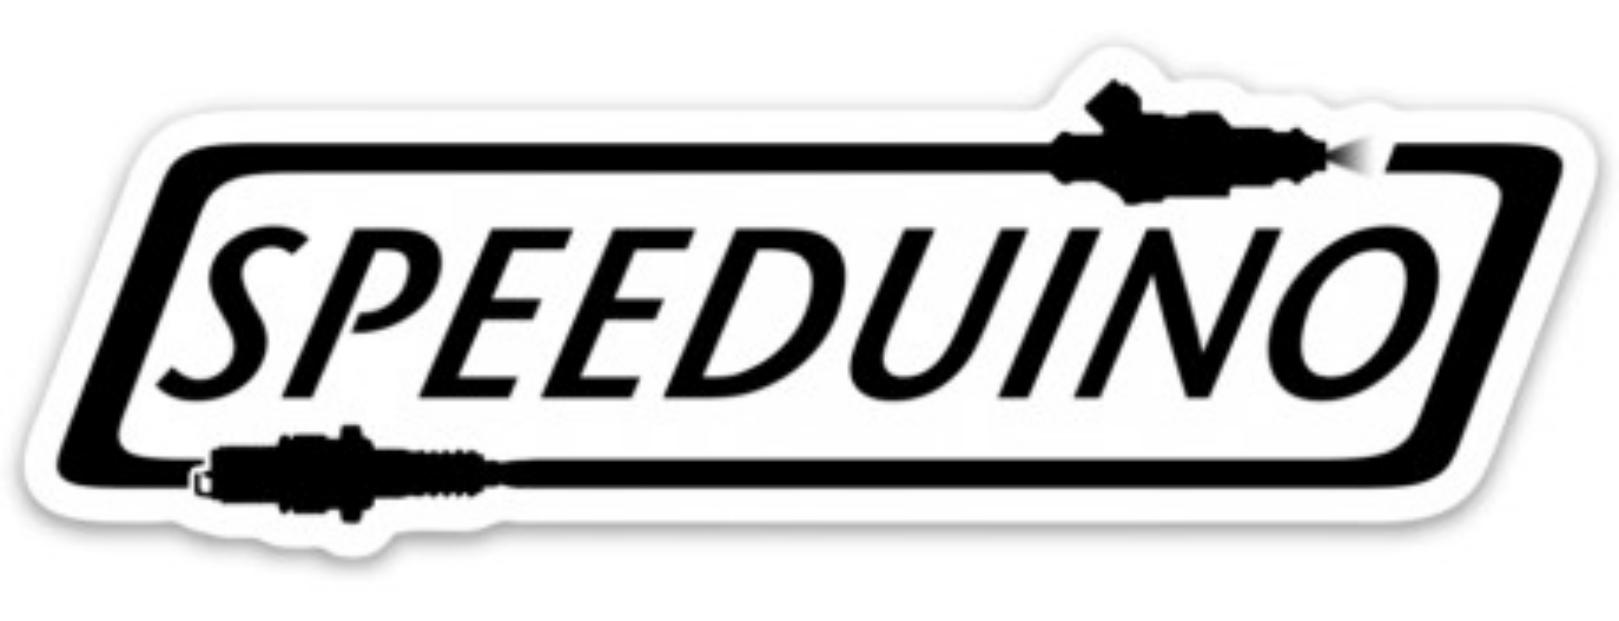 Speeduino Logo